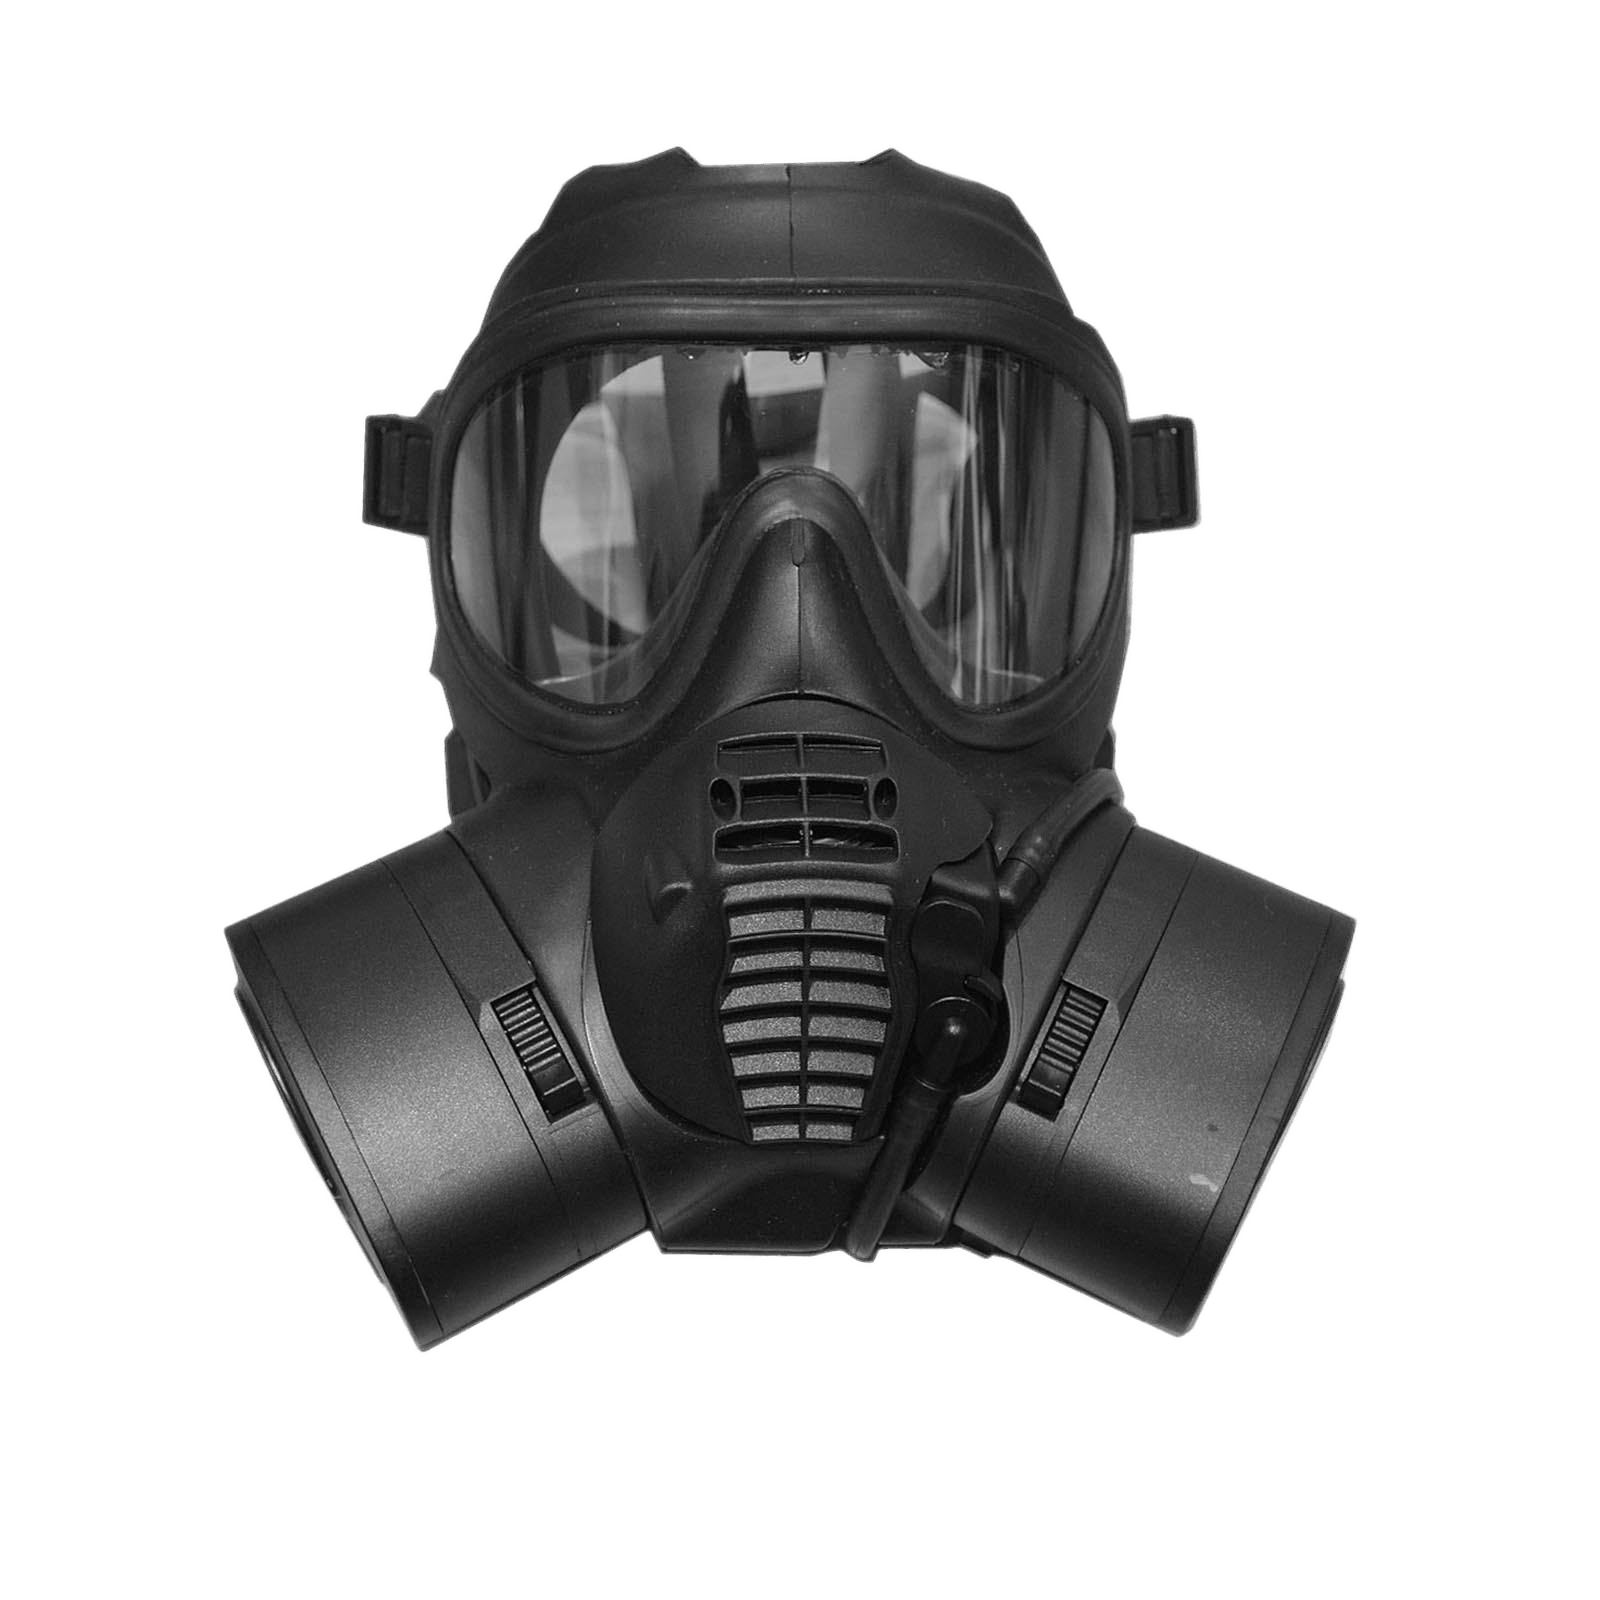 British Army GSR Gas Mask transparent PNG.